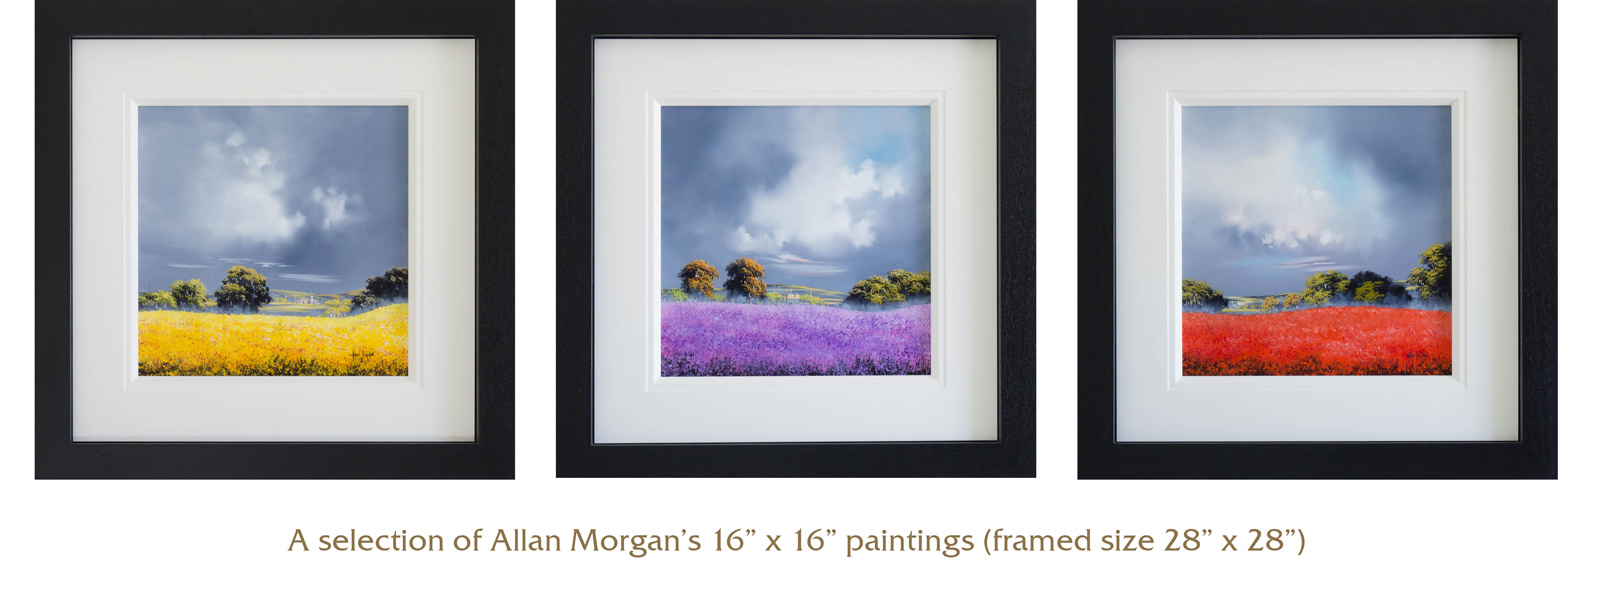 Allan Morgan Small Paintings